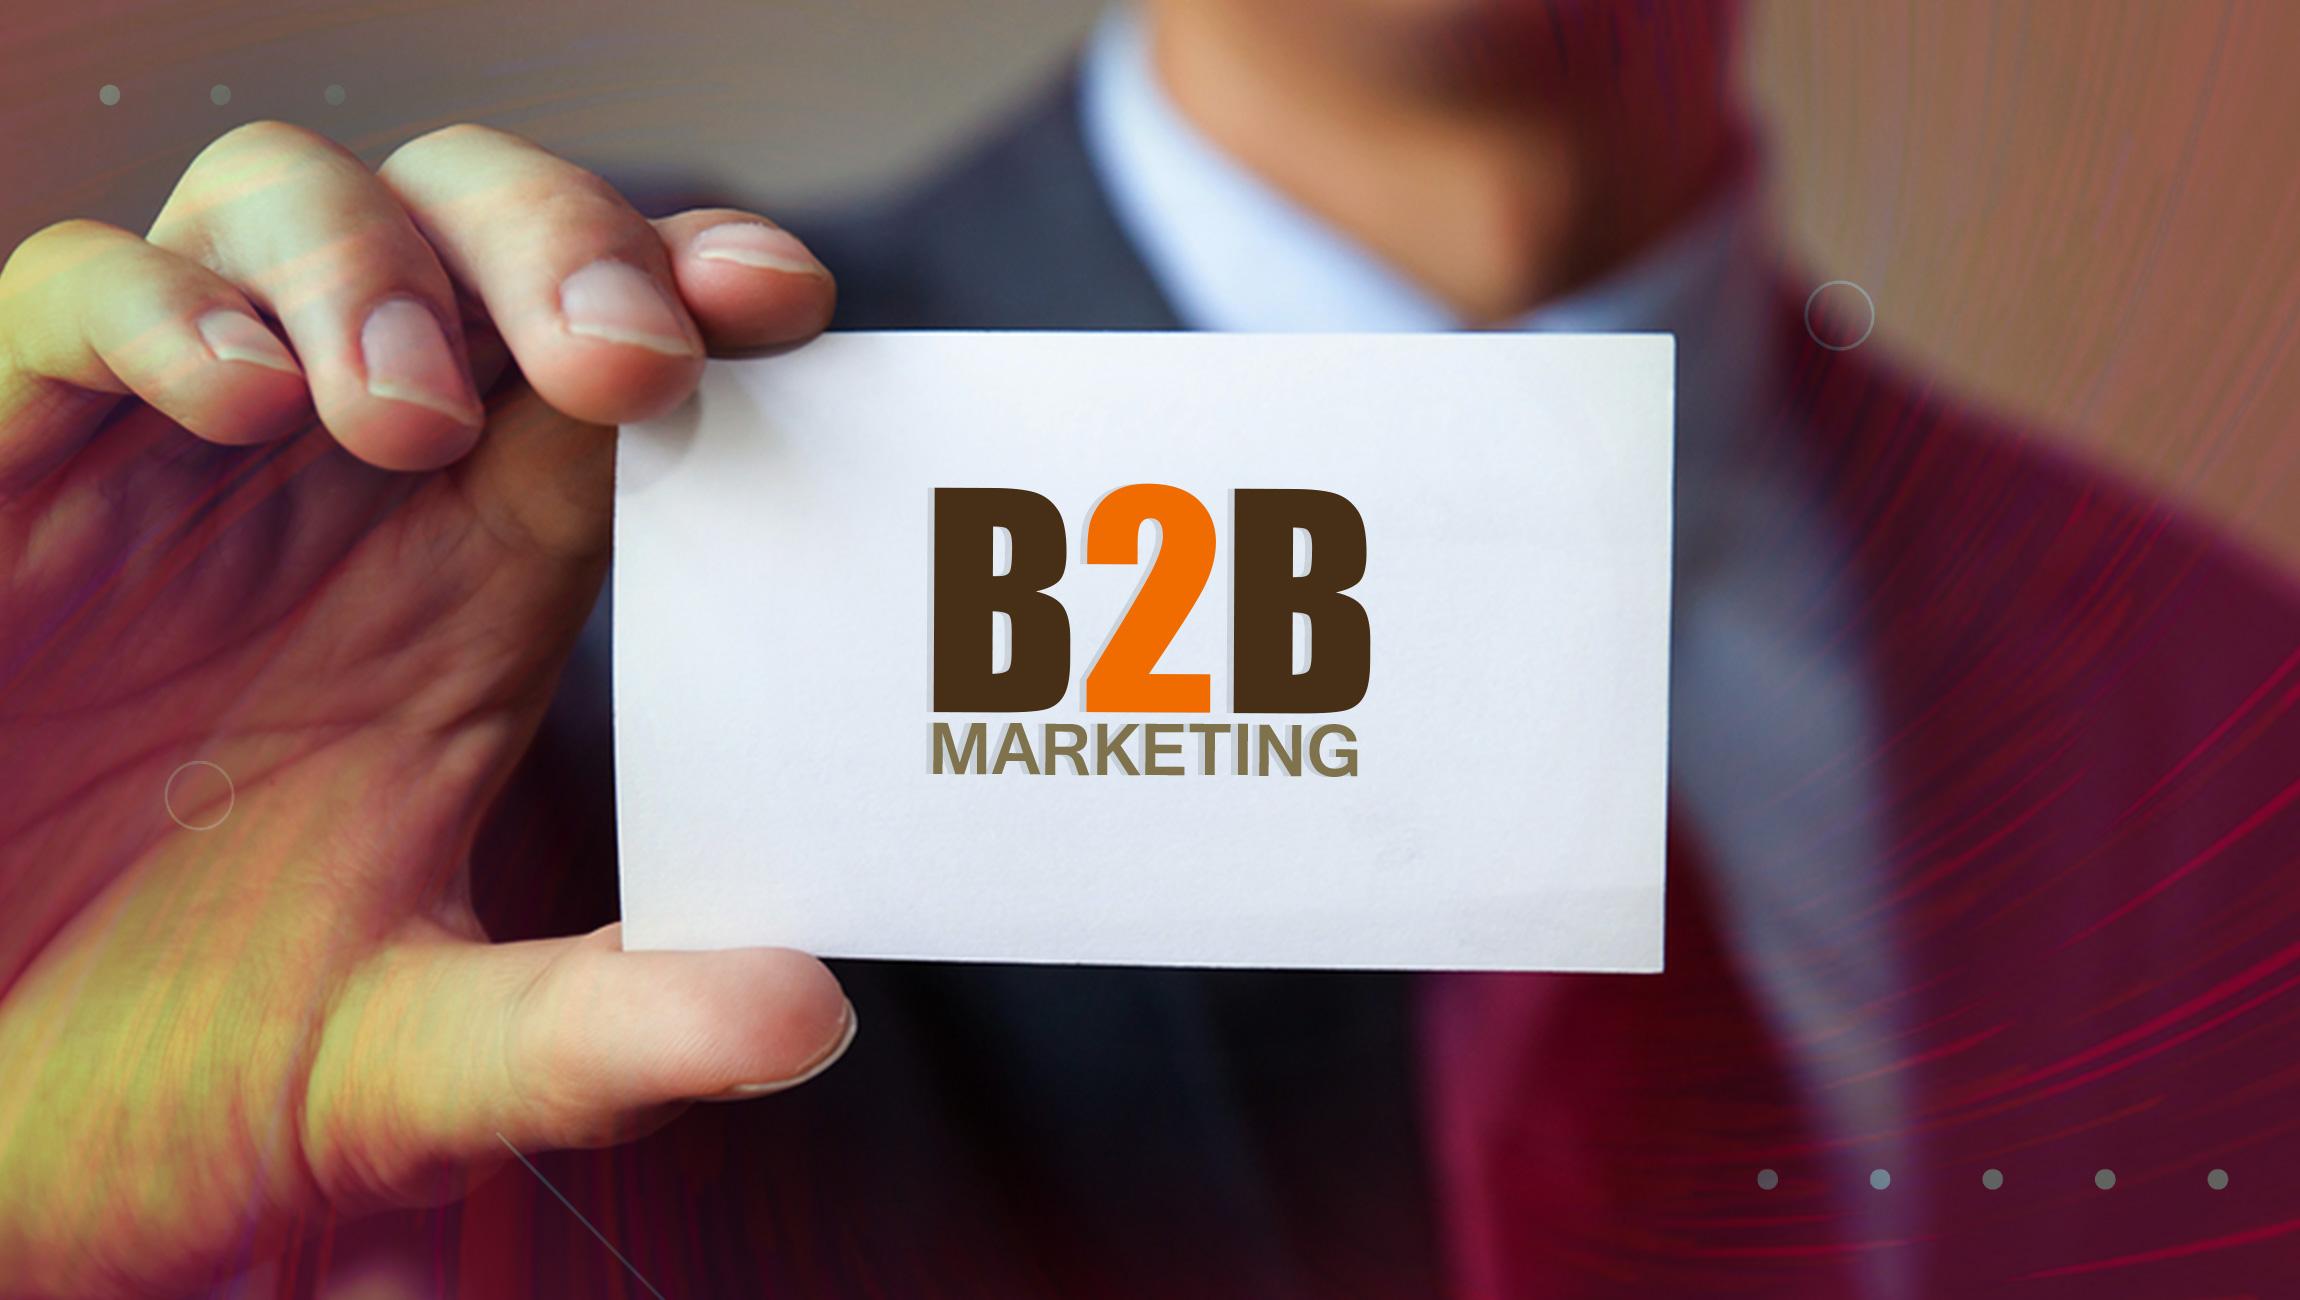 Human Factor - the Weak Link in B2B Marketing